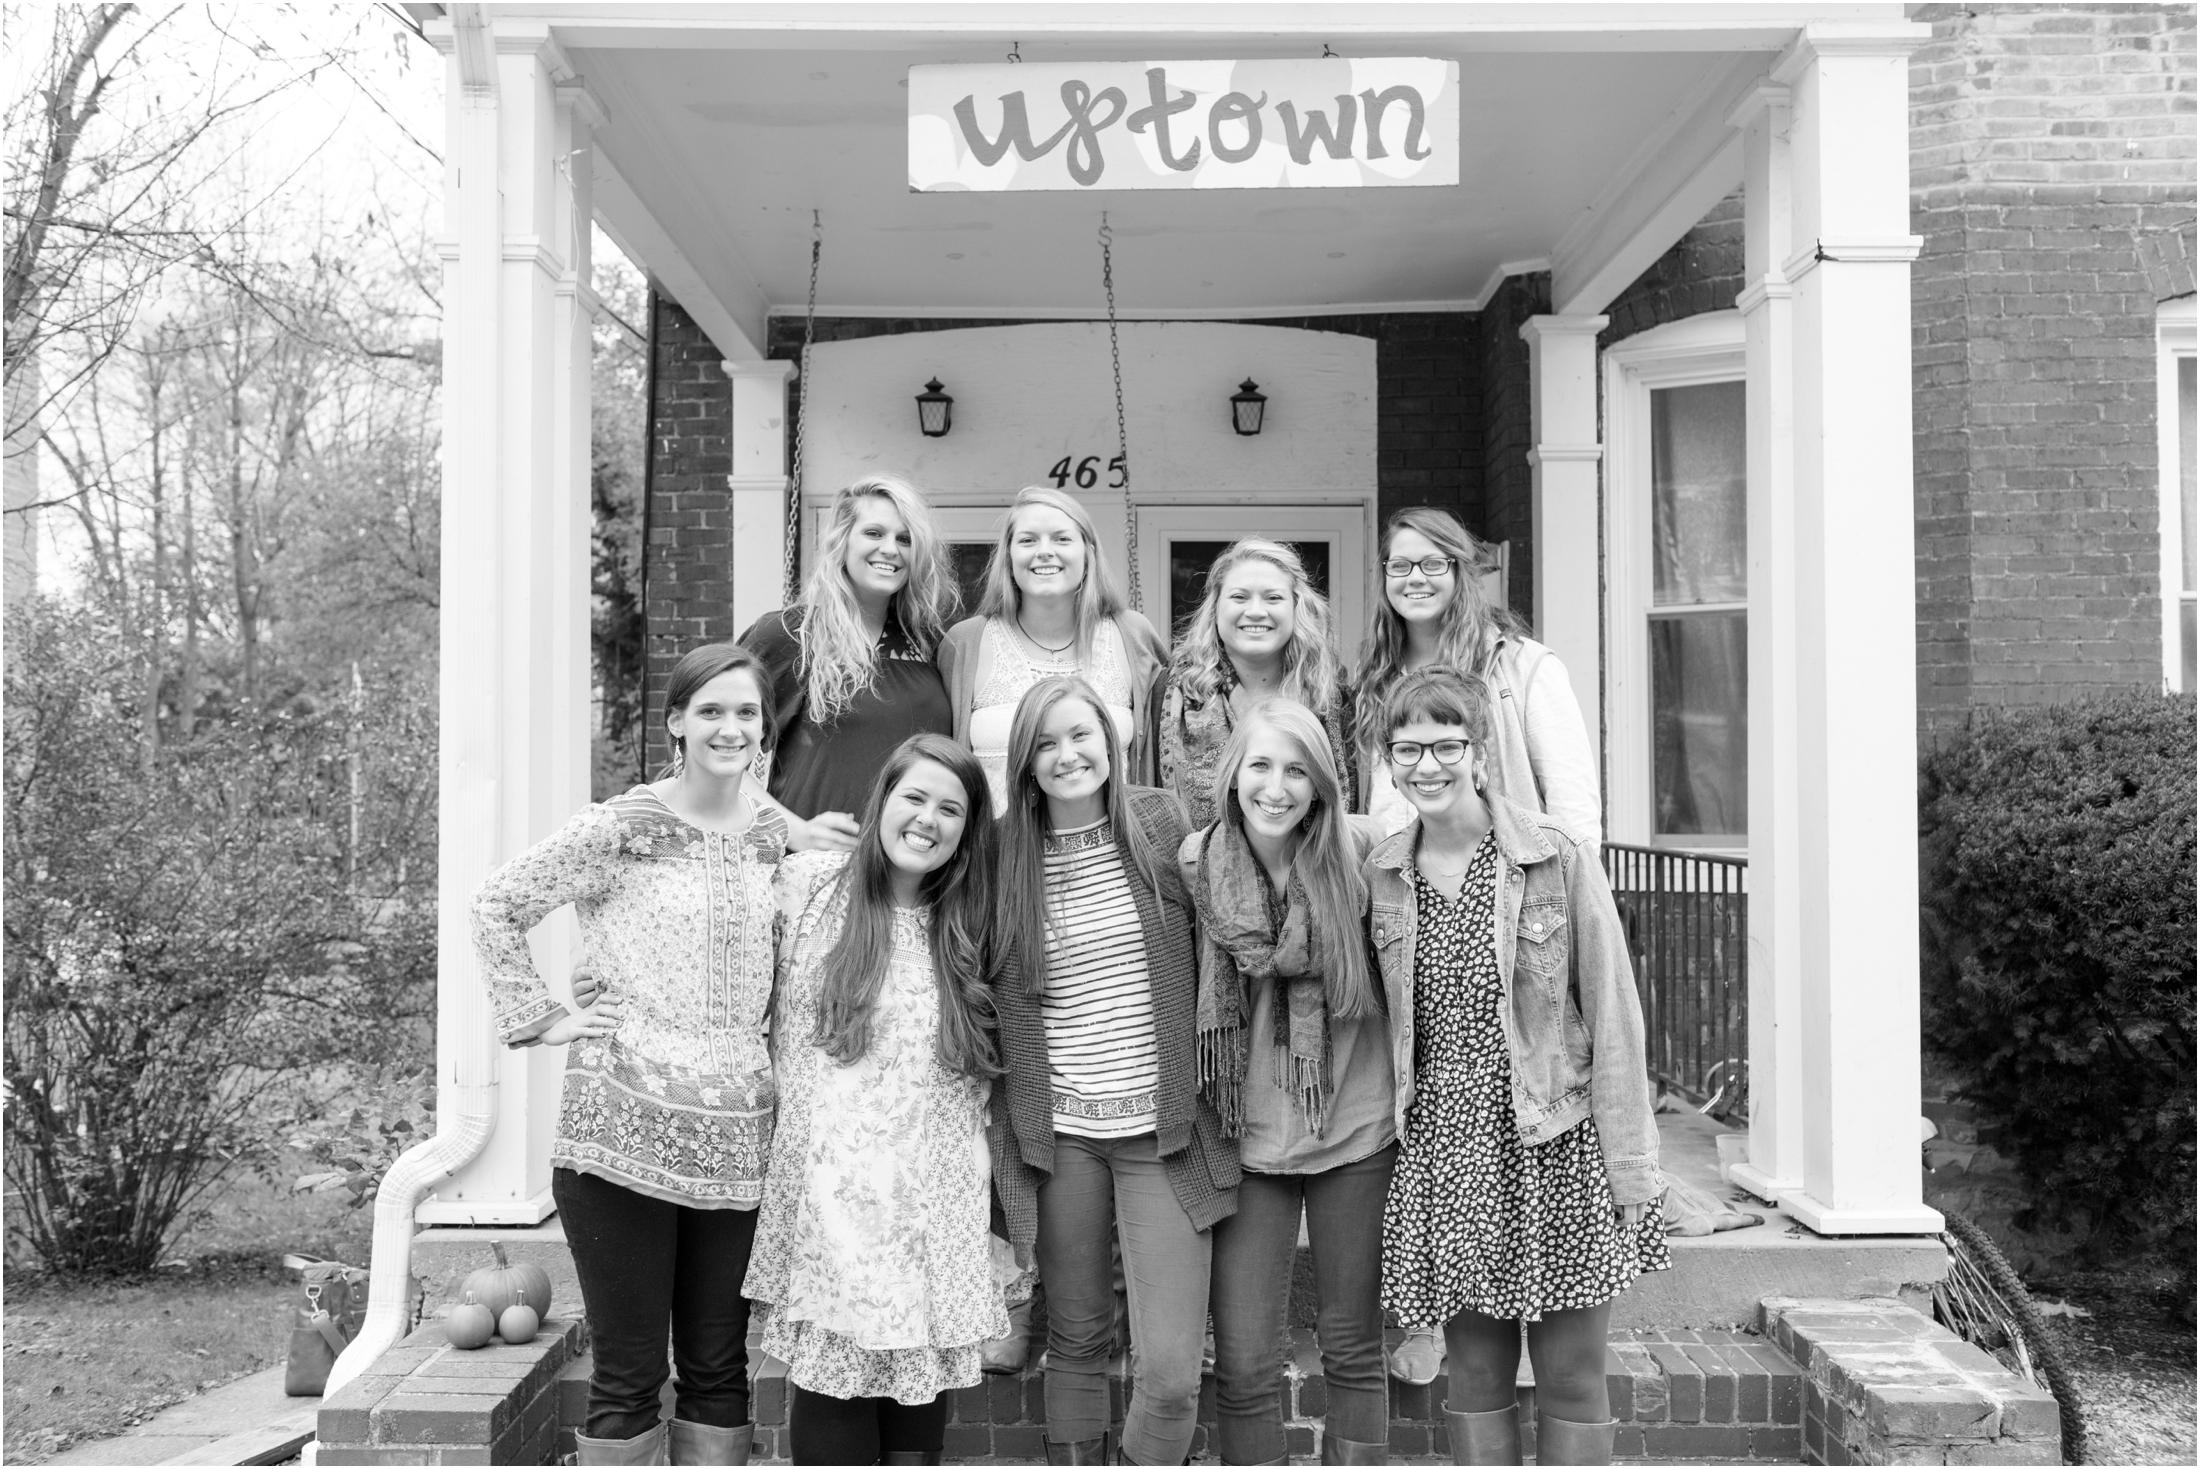 Uptown-2014-18.jpg